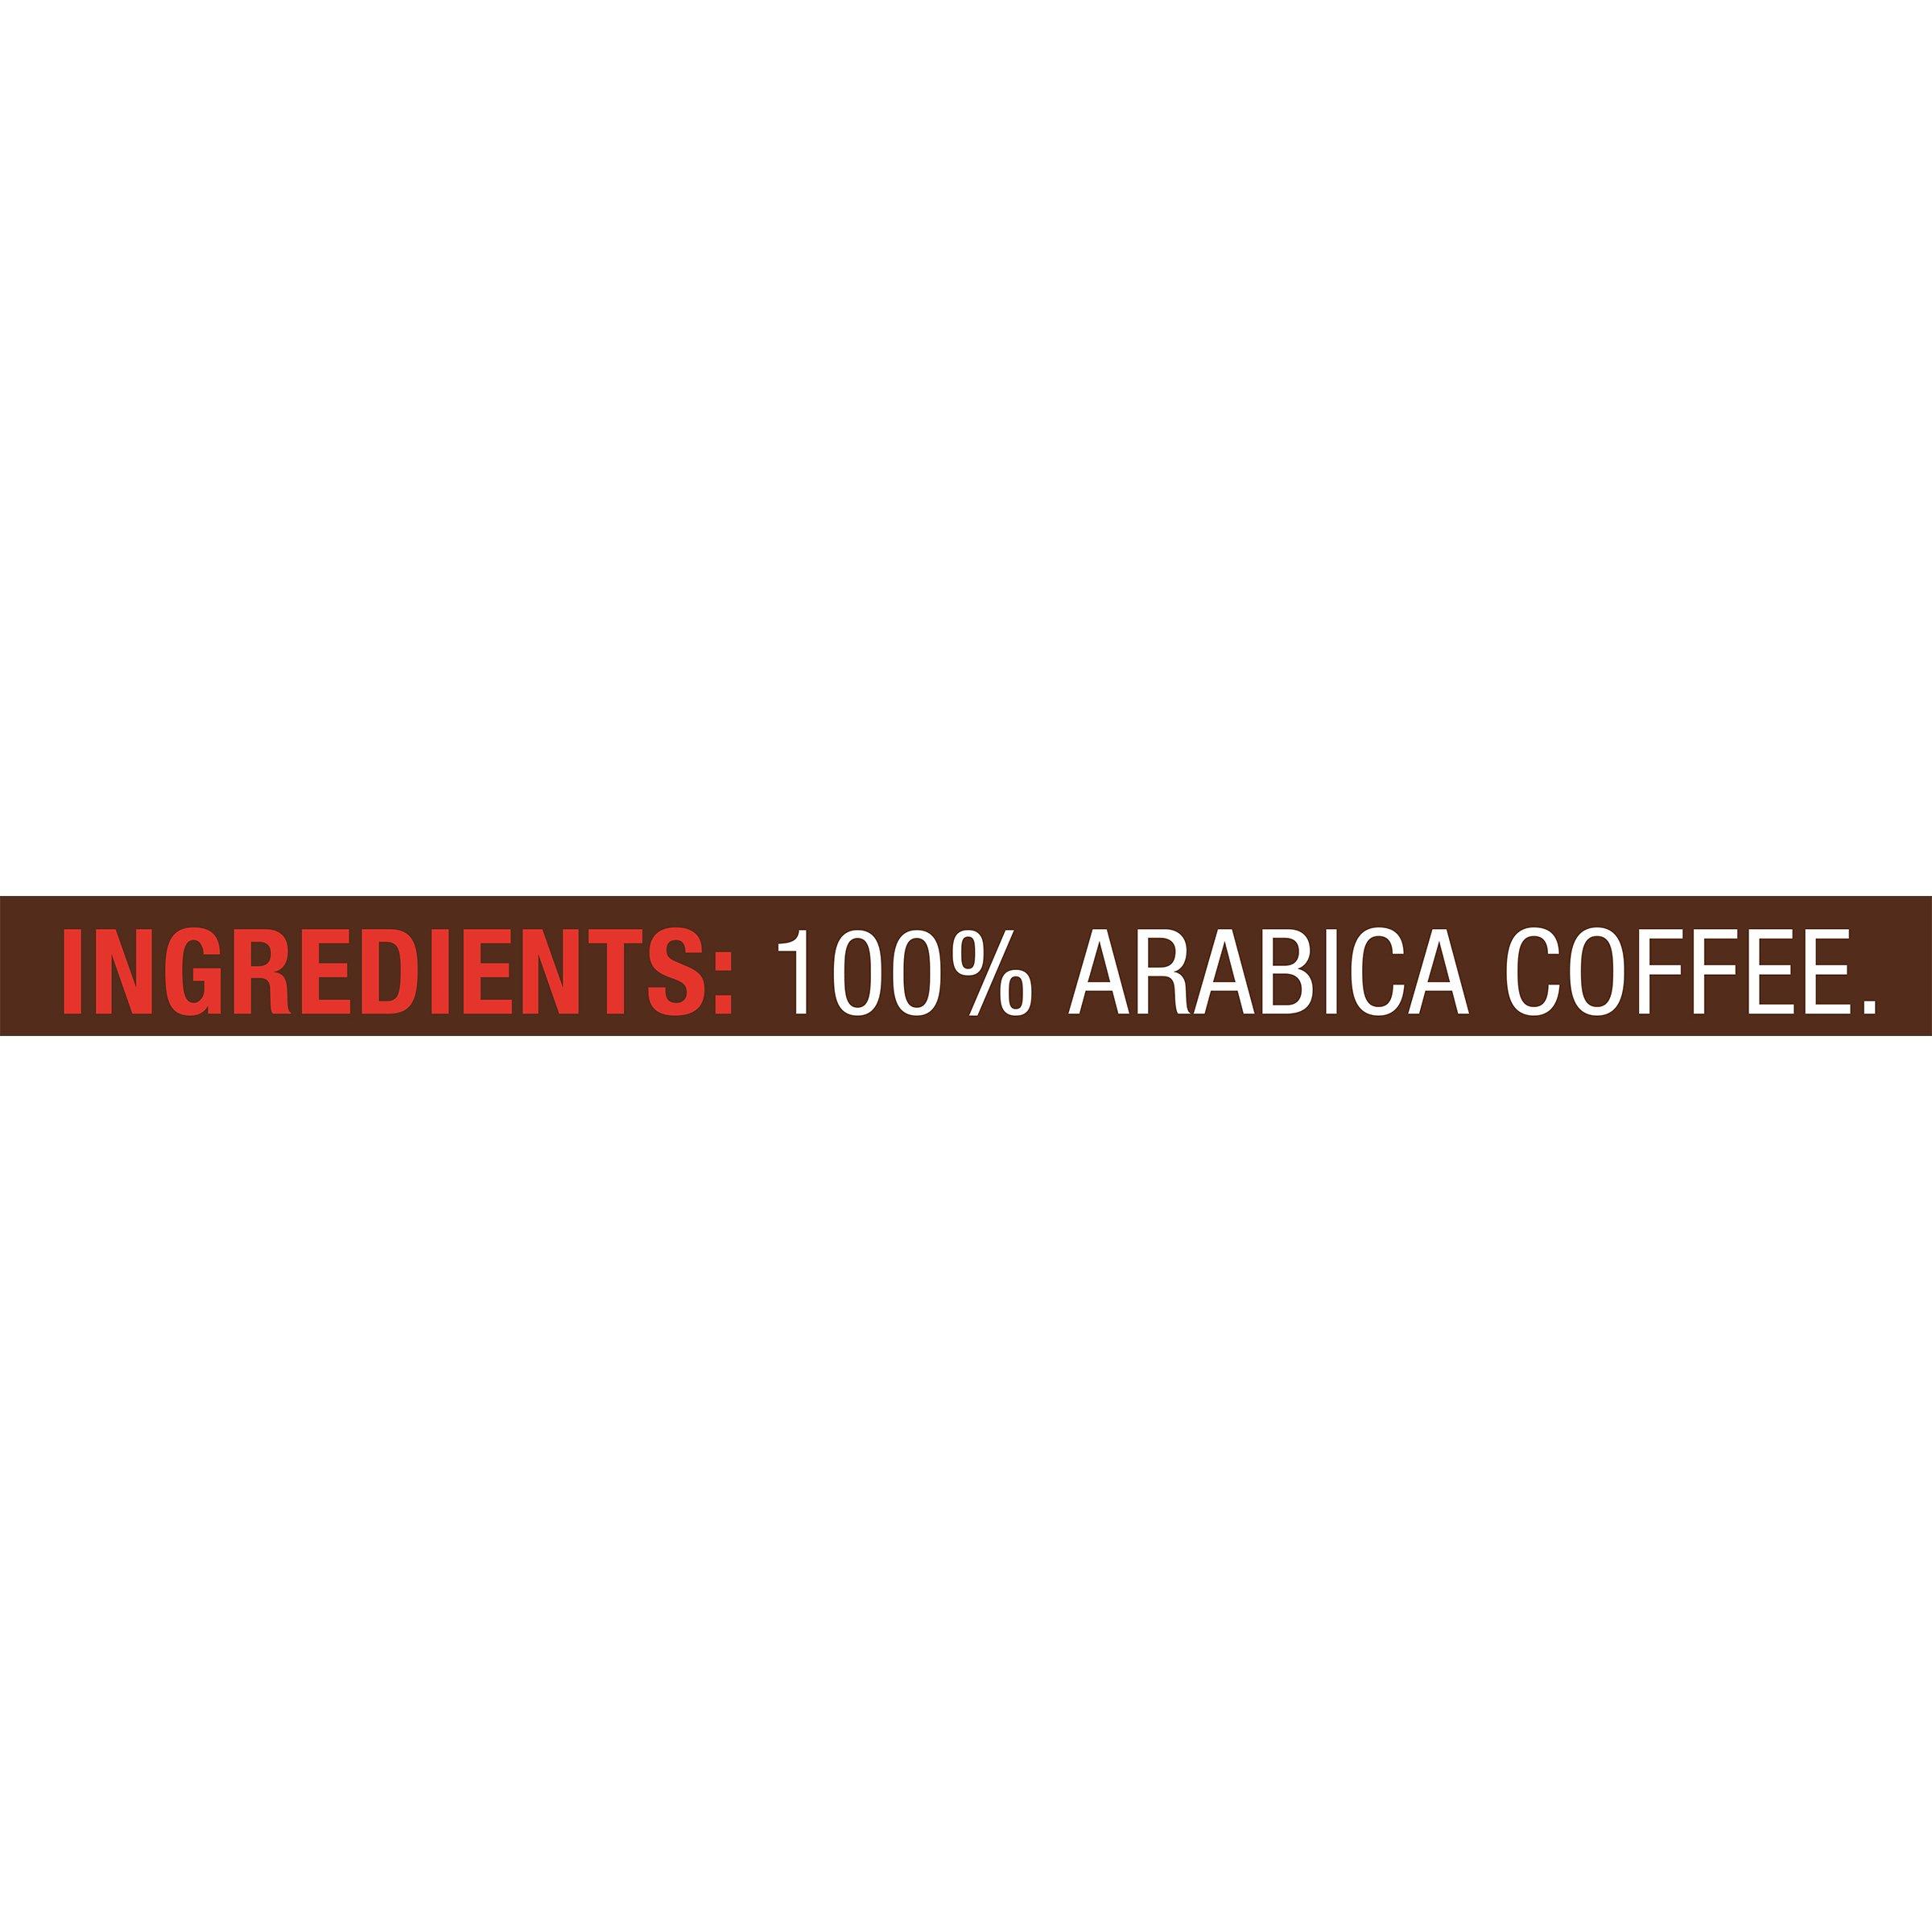 McCafe Premium Roast Coffee K-Cup Pods, 36 Count